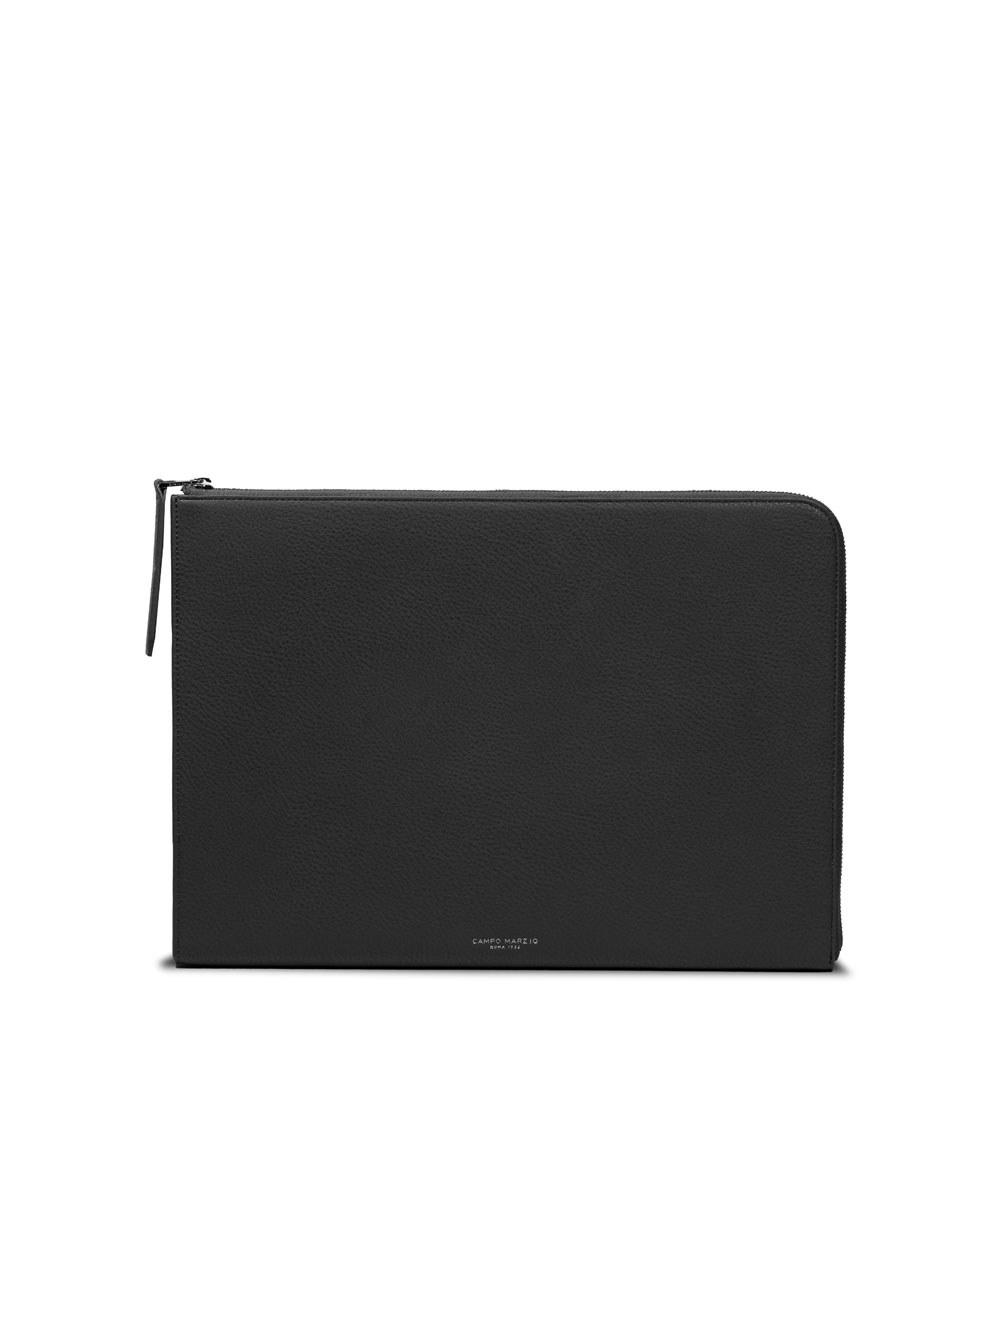 "Laptop Sleeve 13"" - Black"